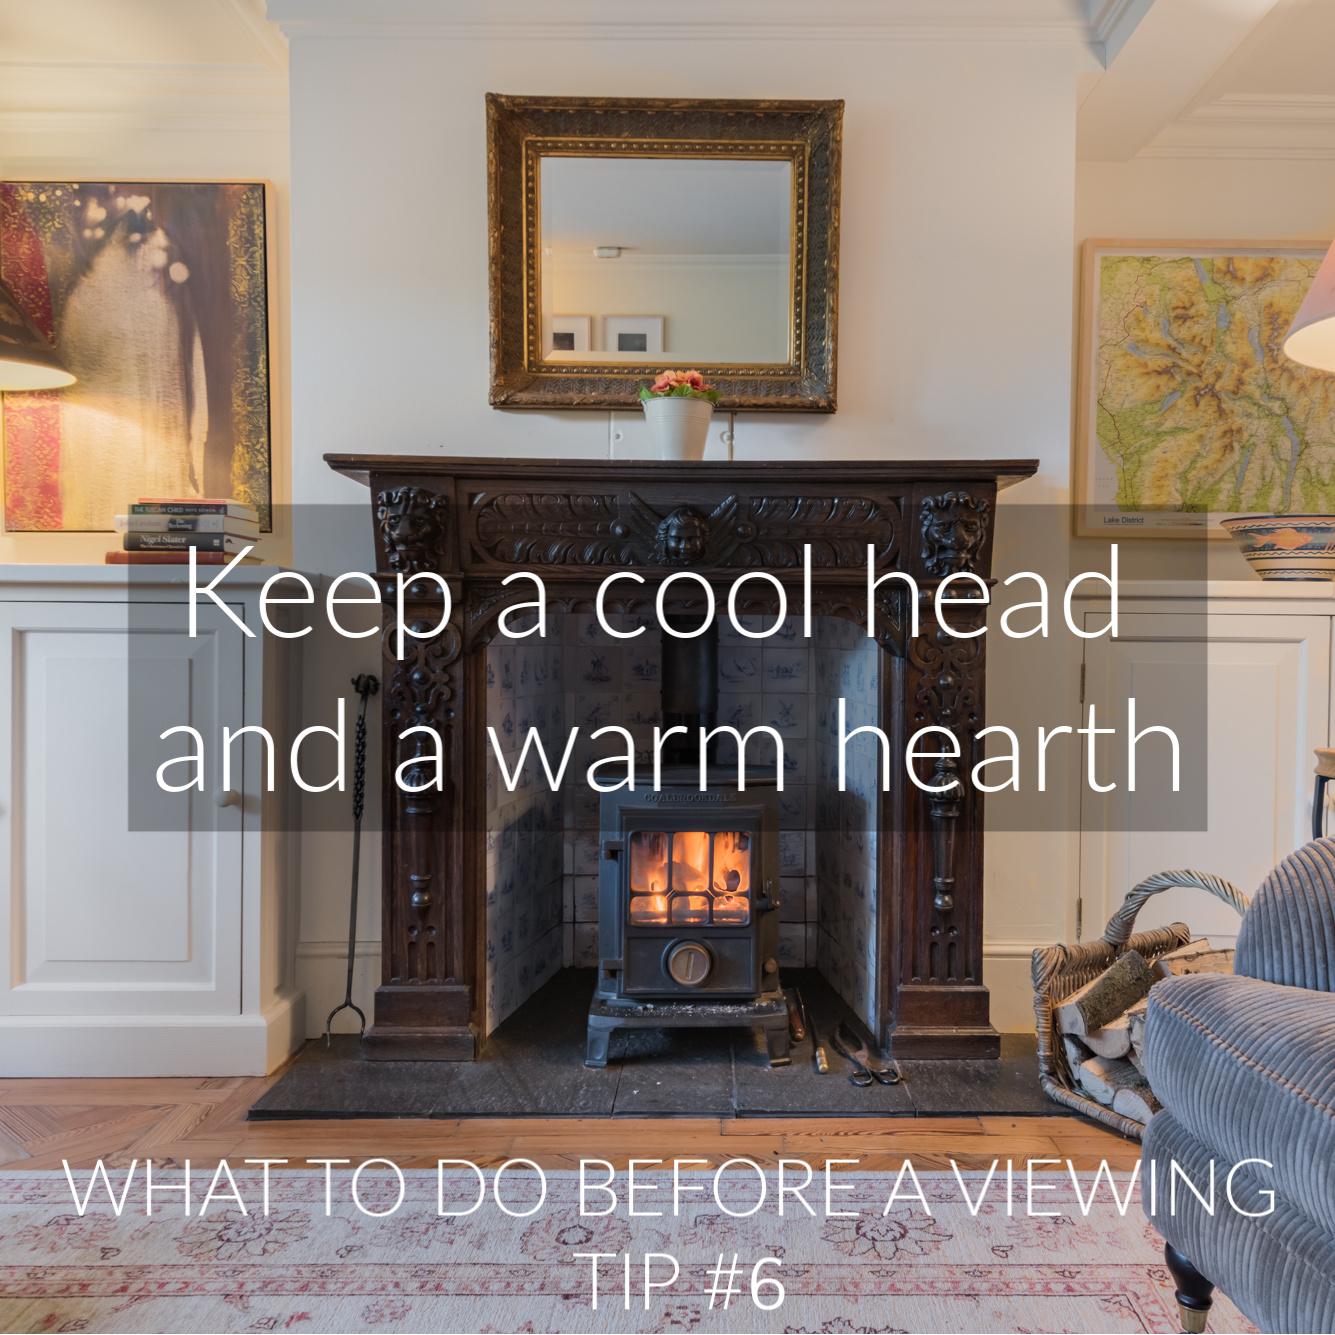 tg6-keep-a-cool-head